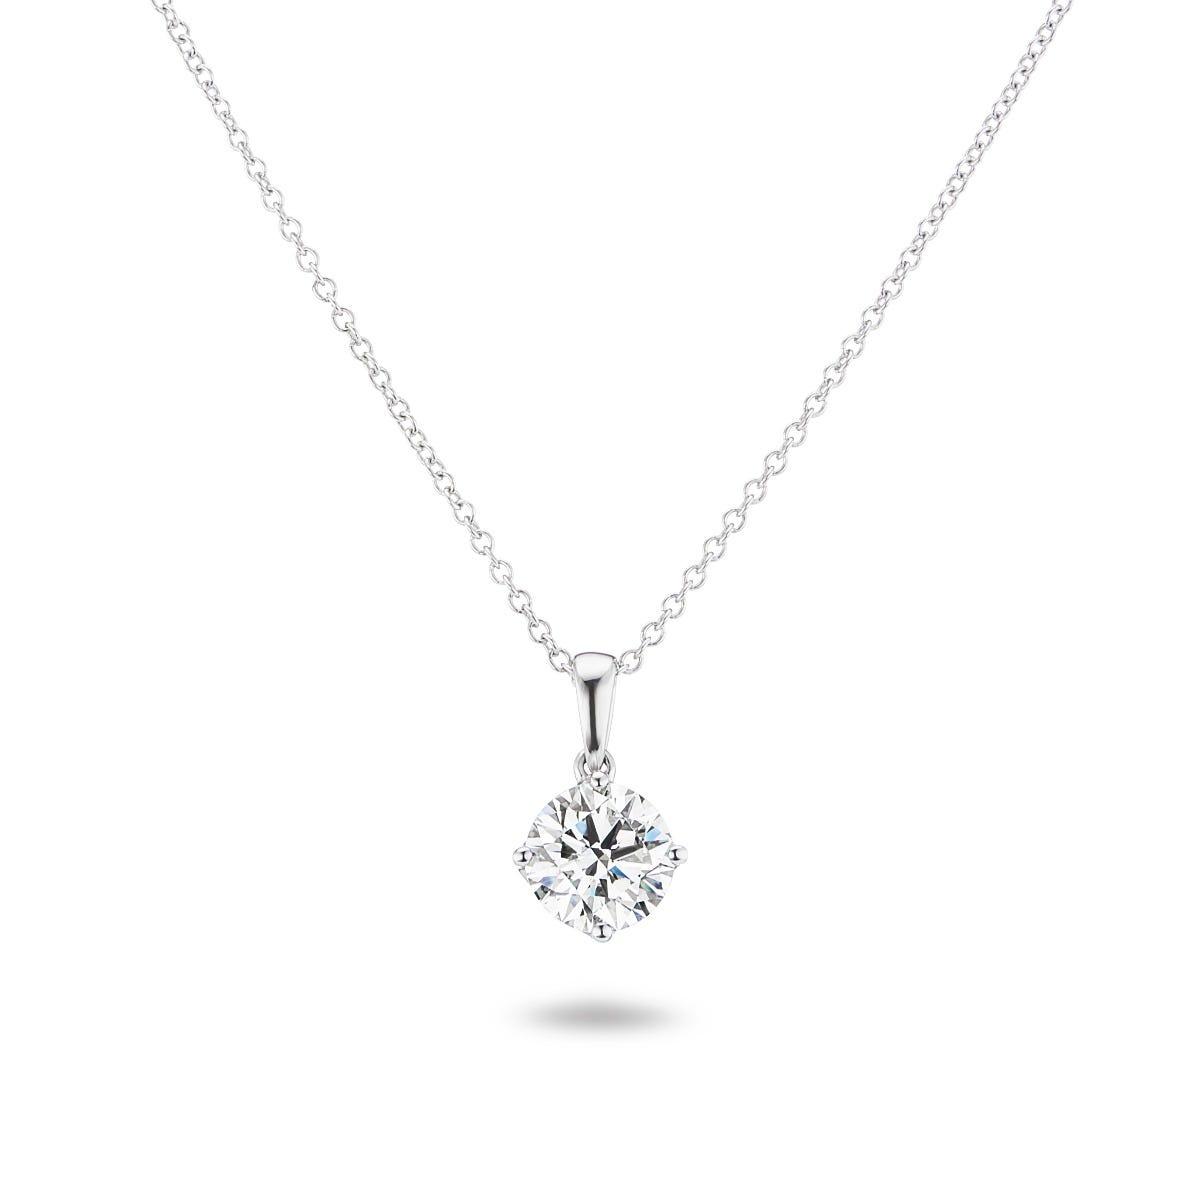 Lab Grown 7/8ct. Diamond 4-Prong Pendant in 14k White Gold